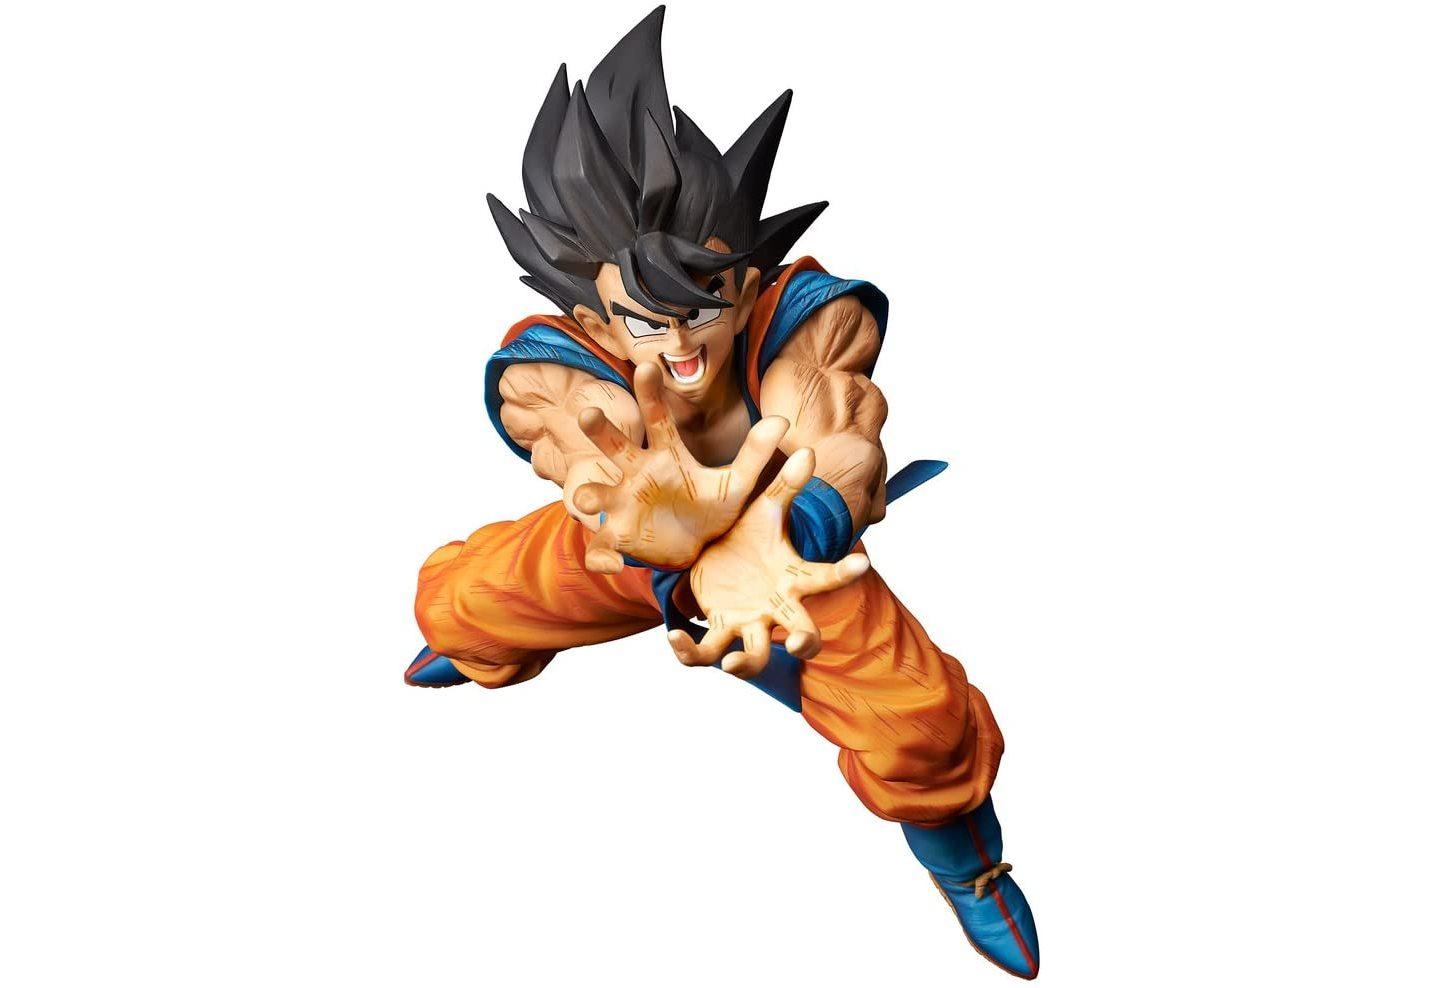 Dragon Ball Z Kamehameha Wave Son Goku Action Figure